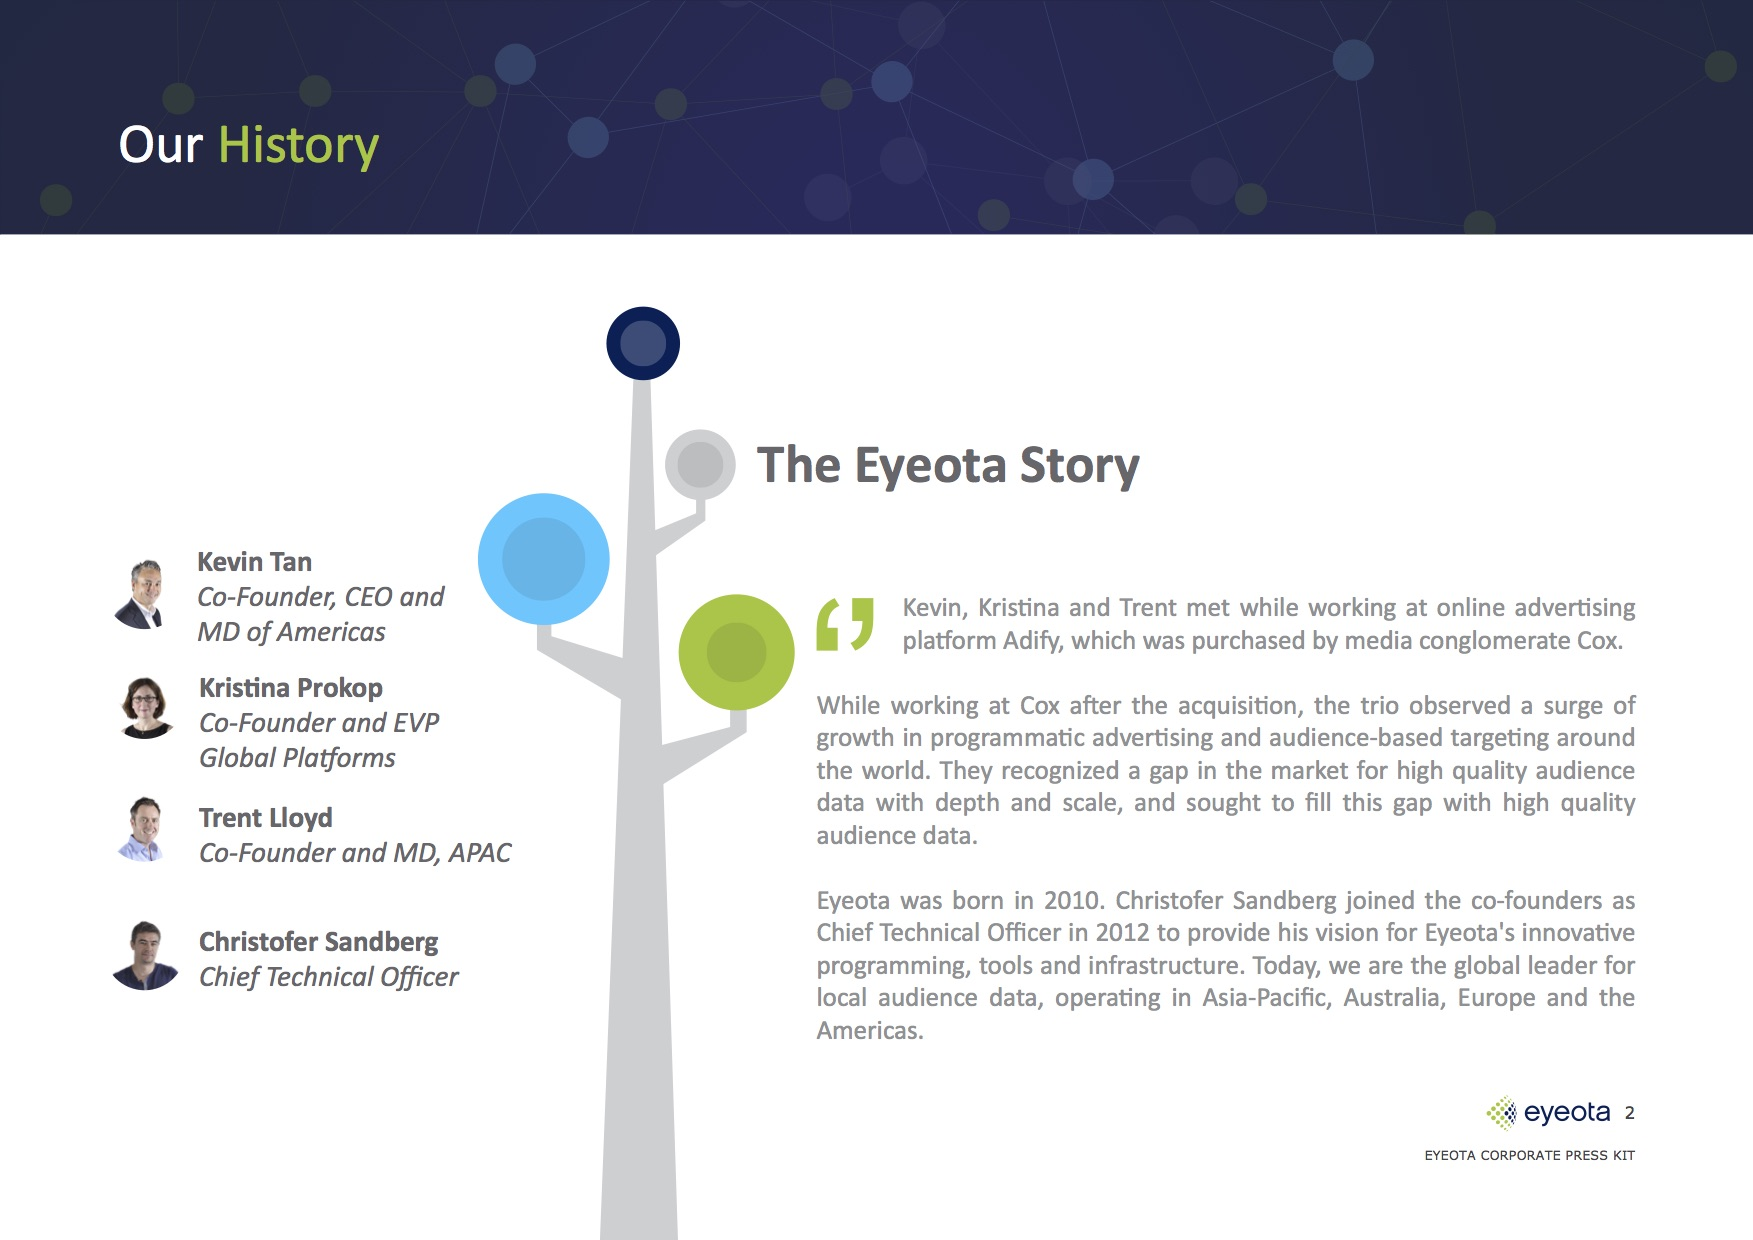 Eyeota_Press_Kit_Story.jpg